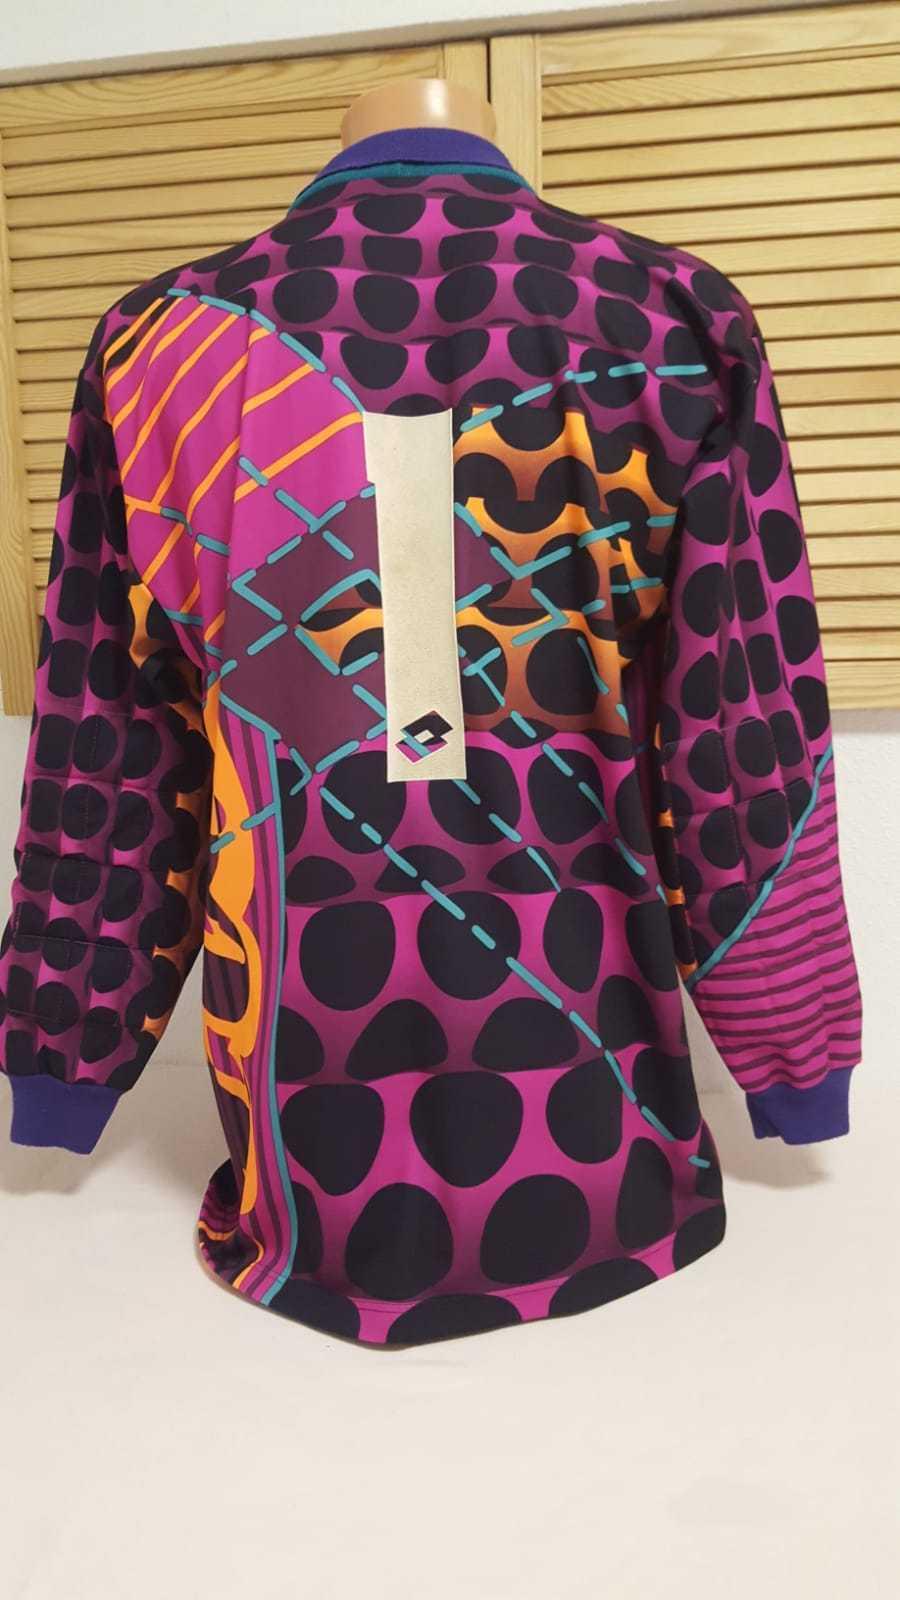 Lotto Vintage Retro Torwart Trikot Shirt Jersey Camiseta Portere Goalkeeper L